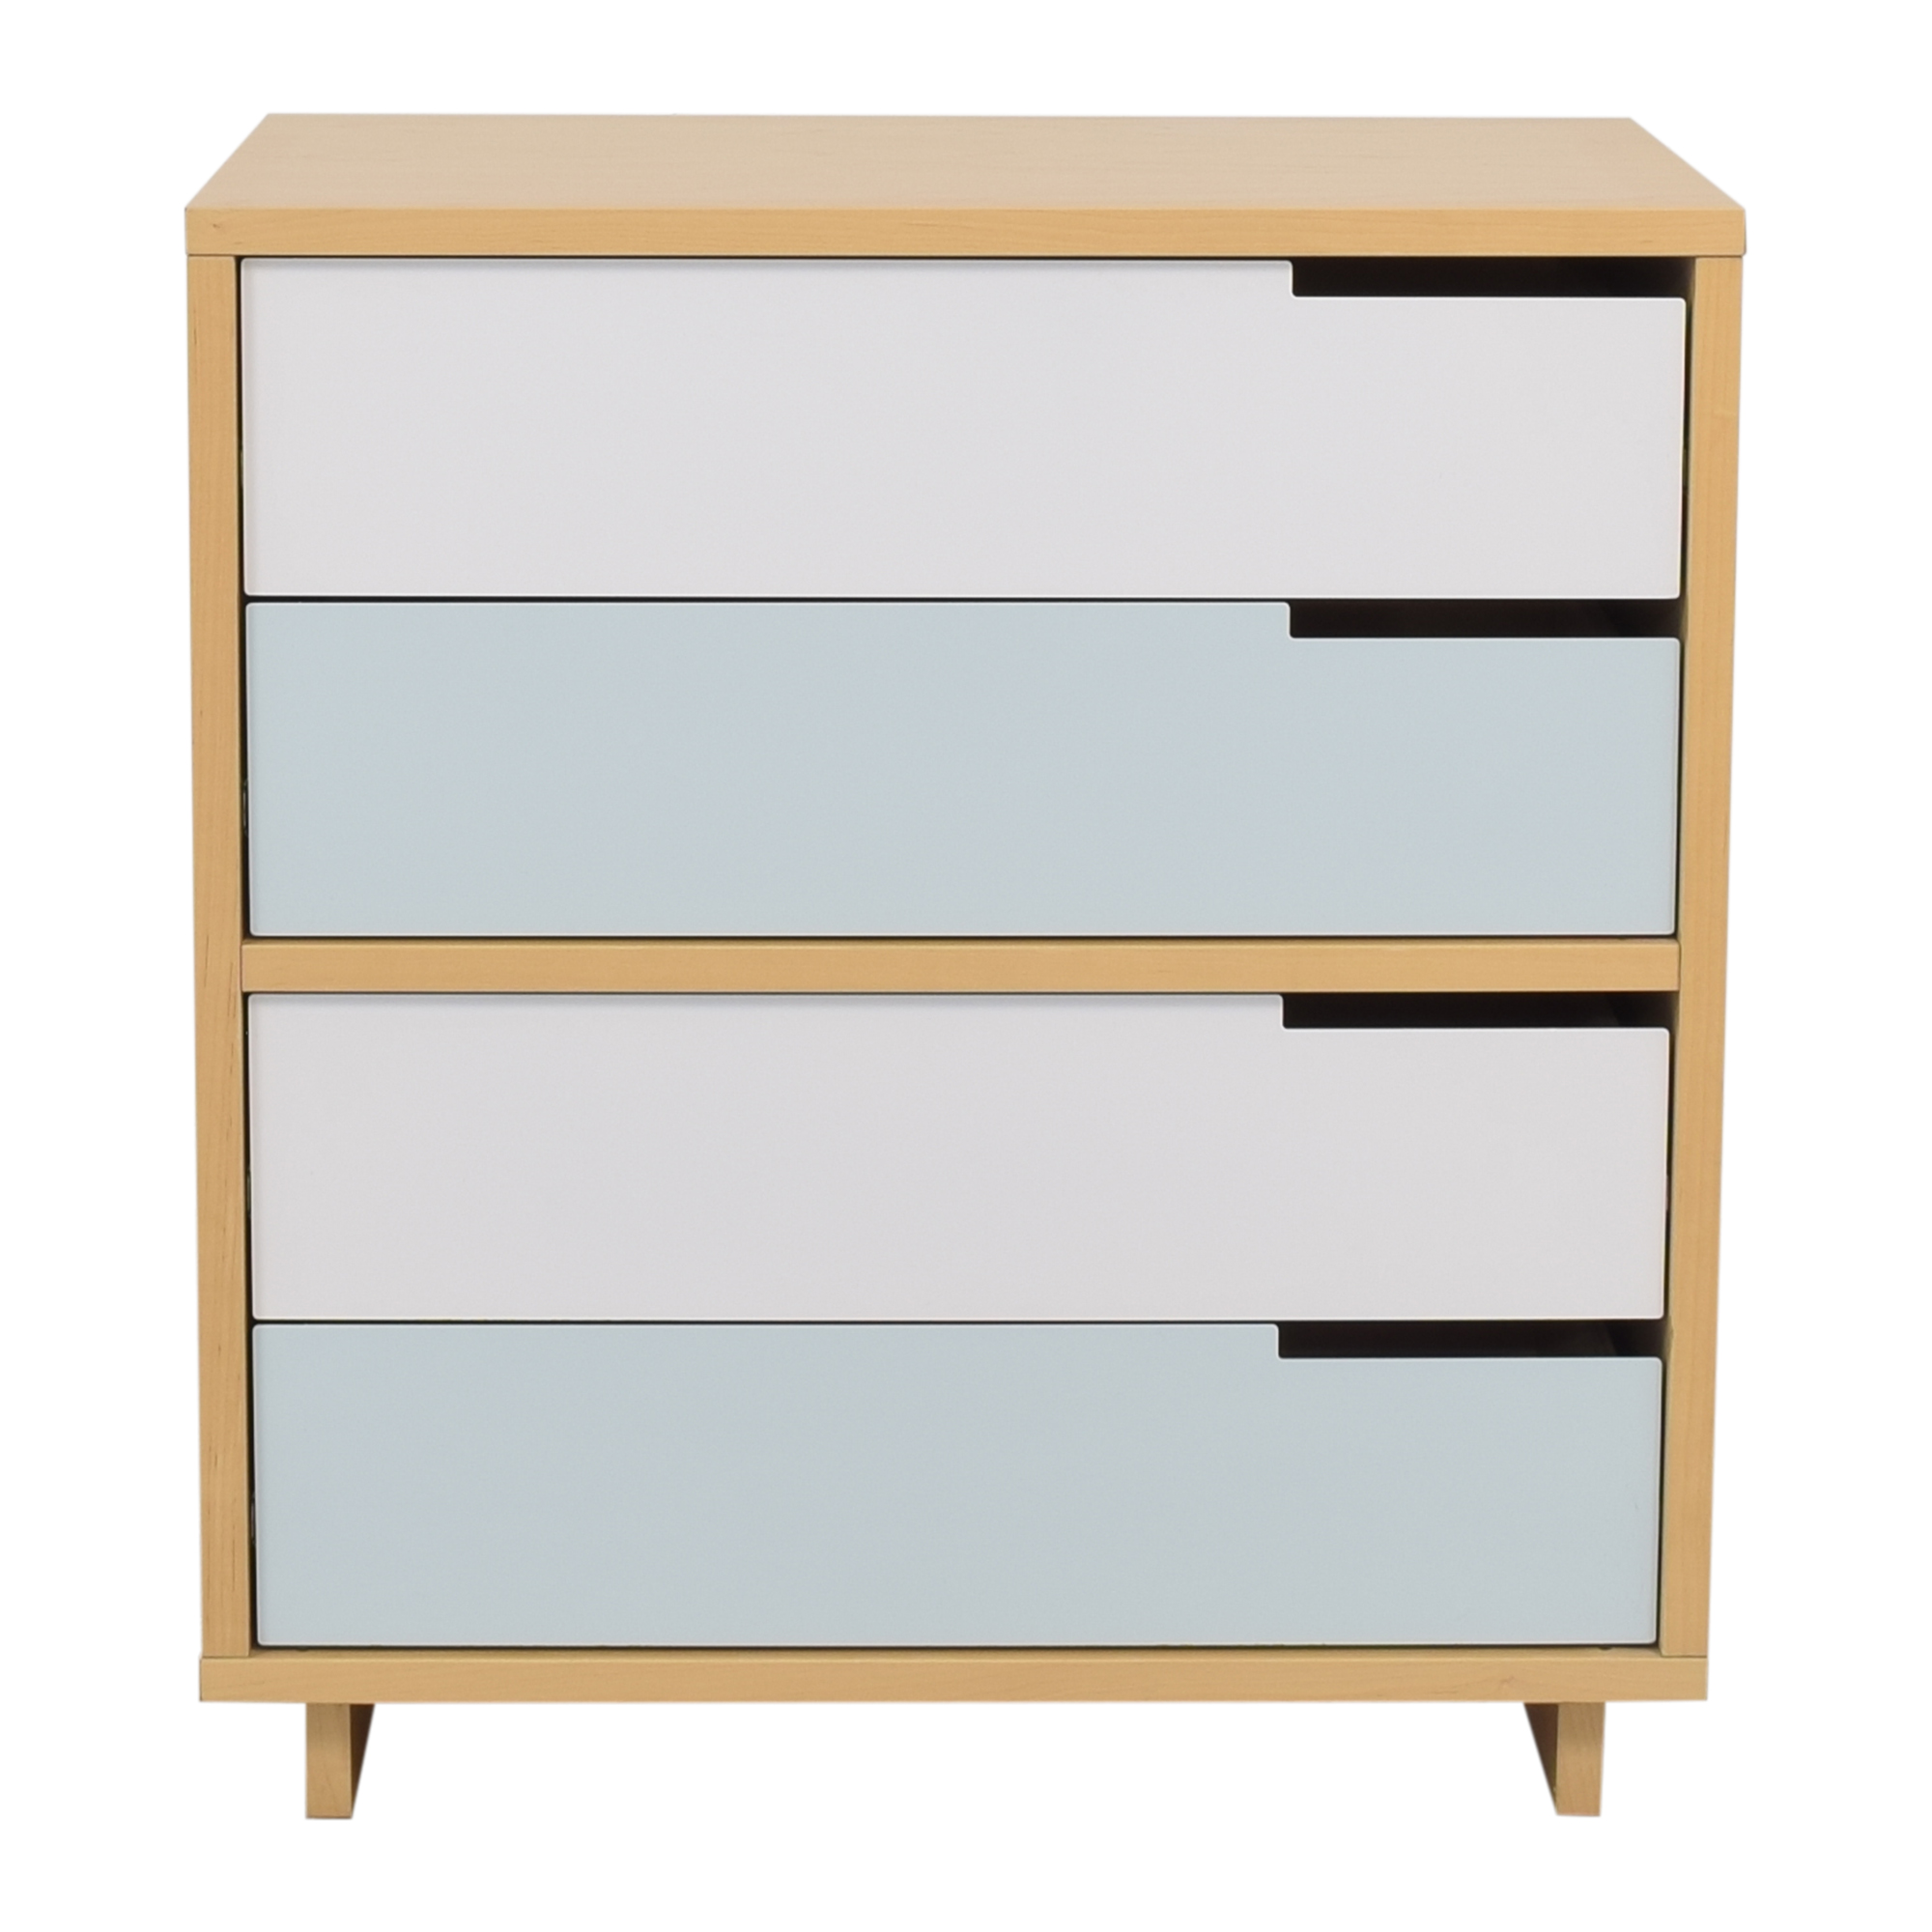 Blu Dot Blu Dot Modu-licious #4 Dresser price